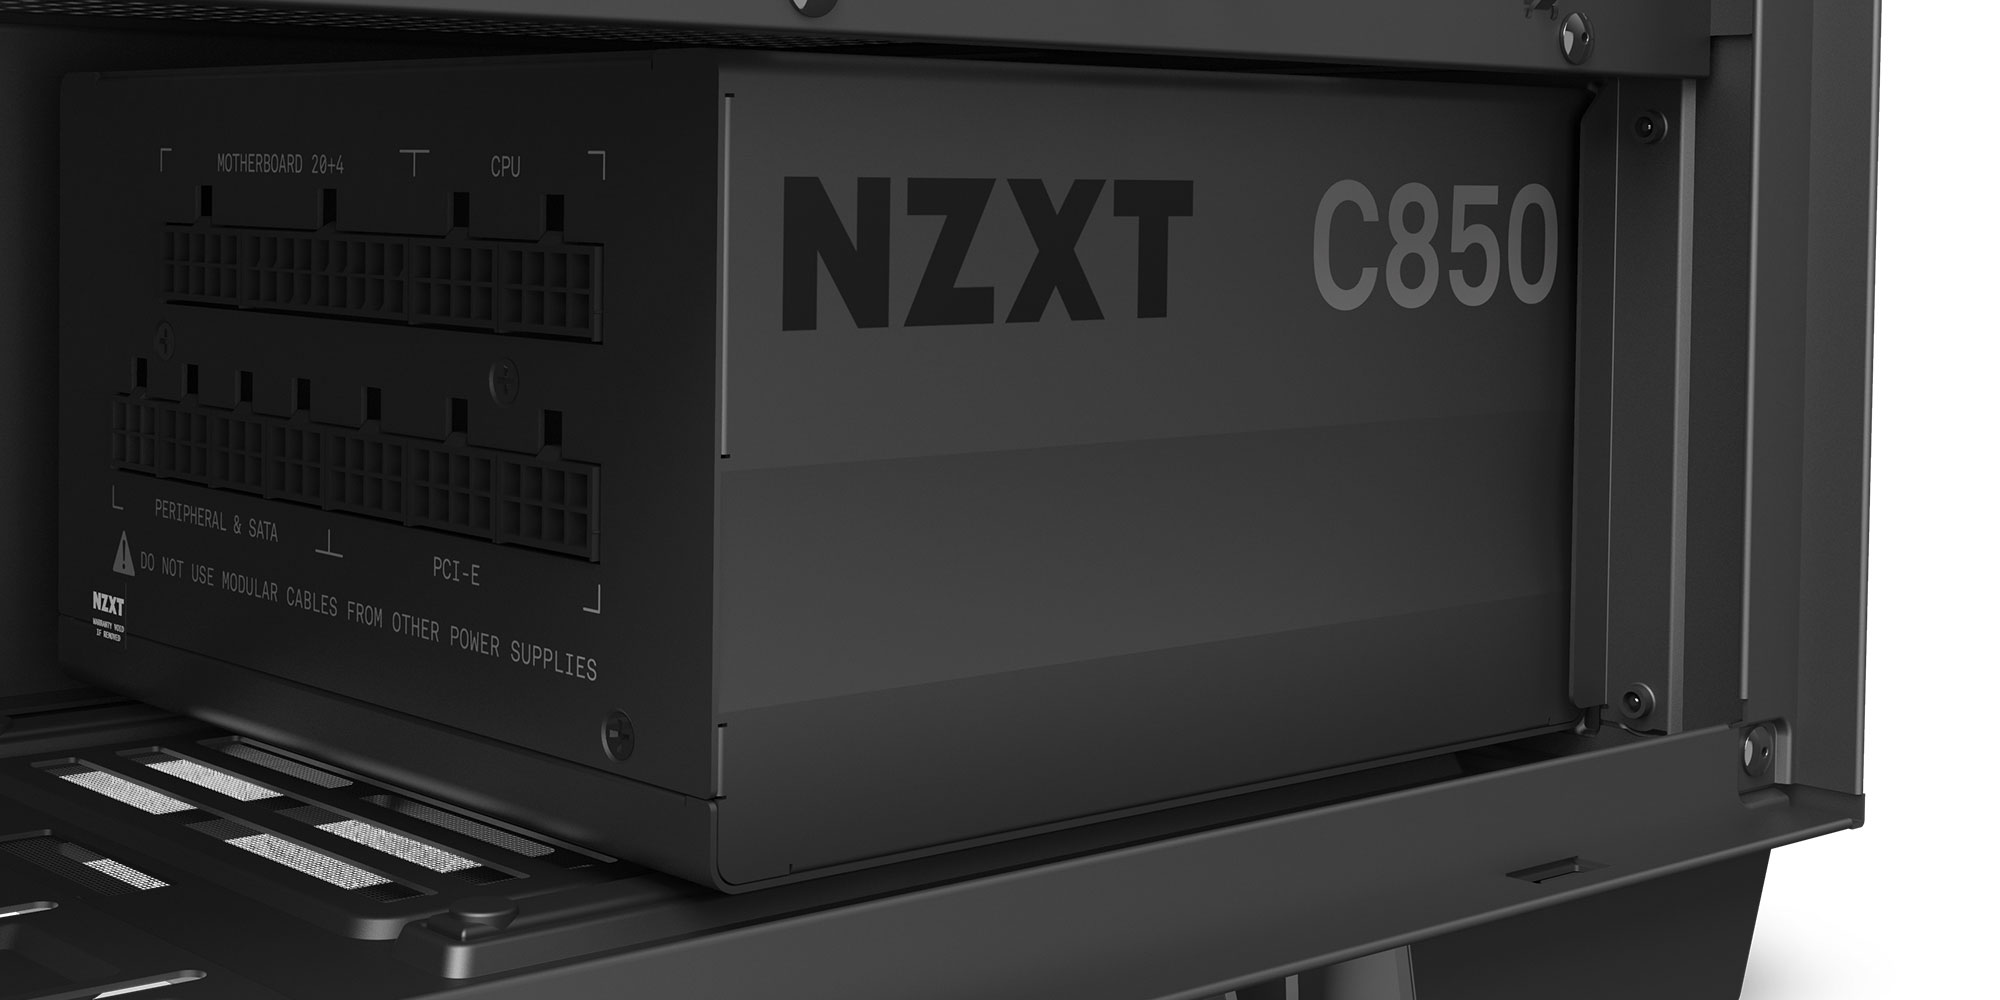 nzxt c850 power supply